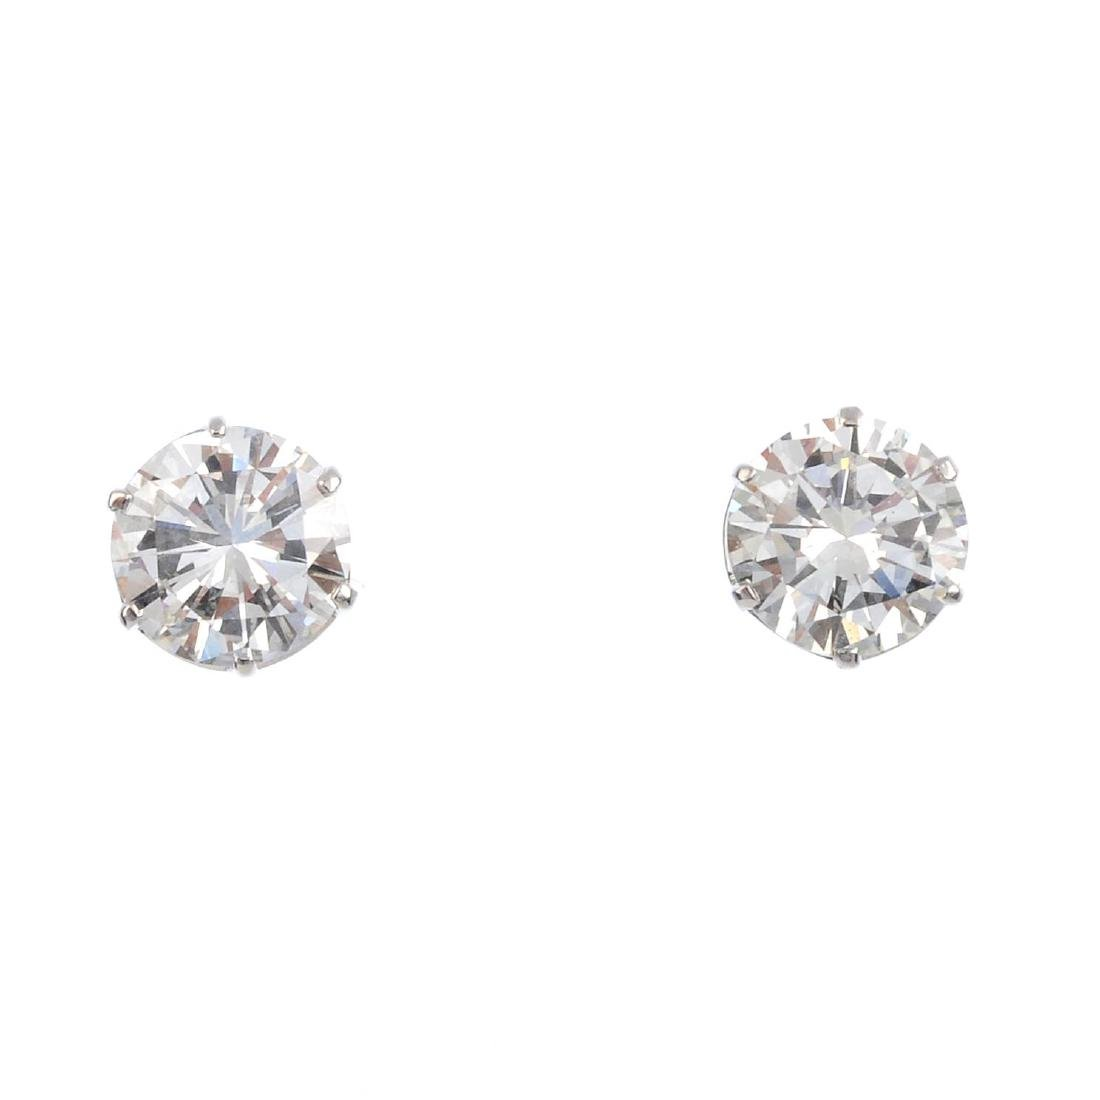 A pair of brilliant-cut diamond single-stone stud